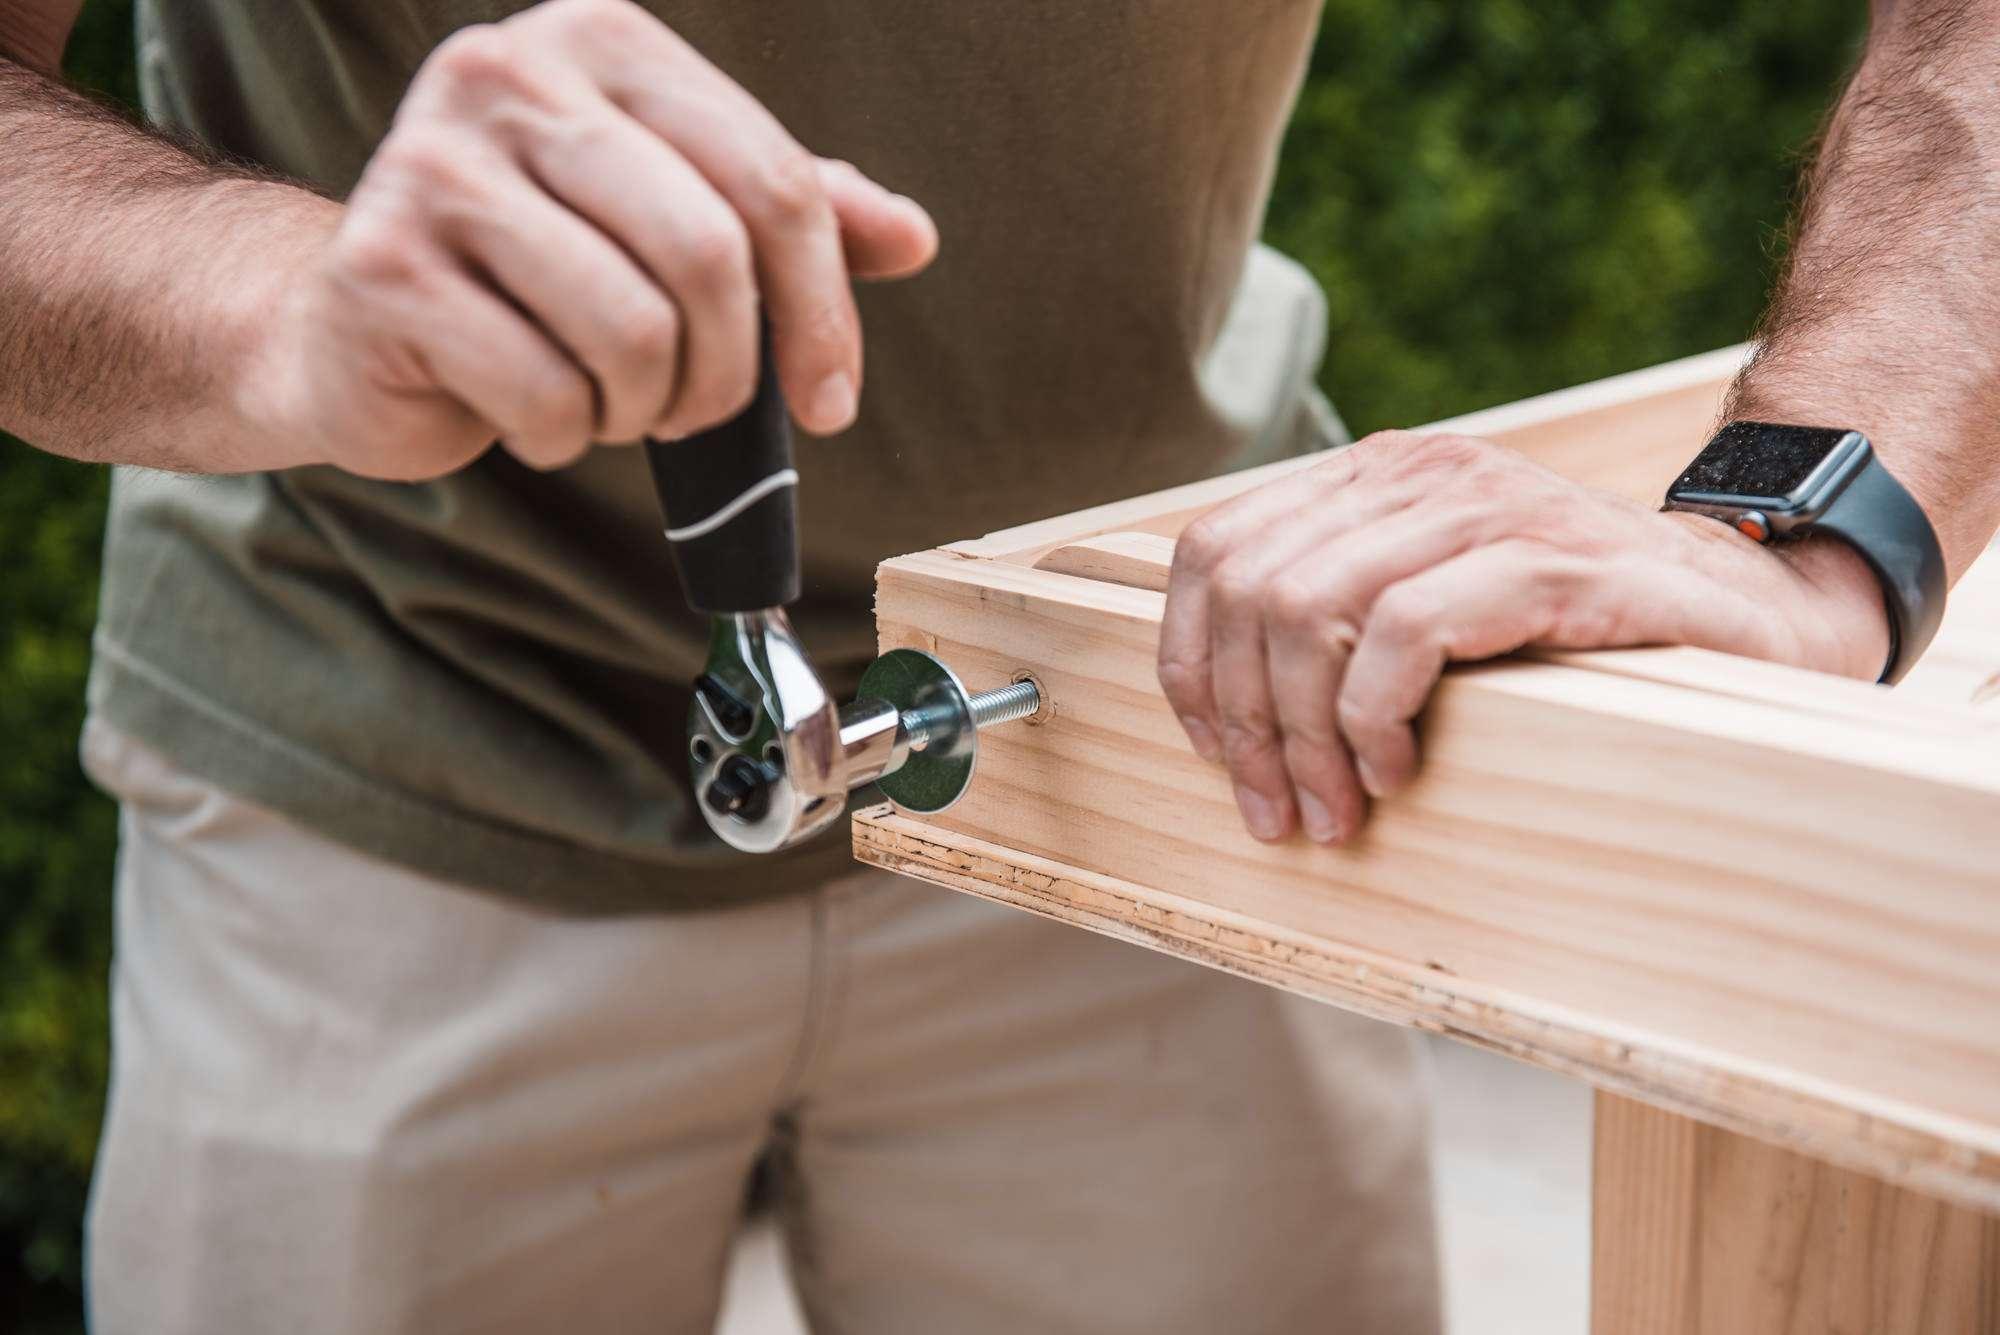 tightening the lock nut